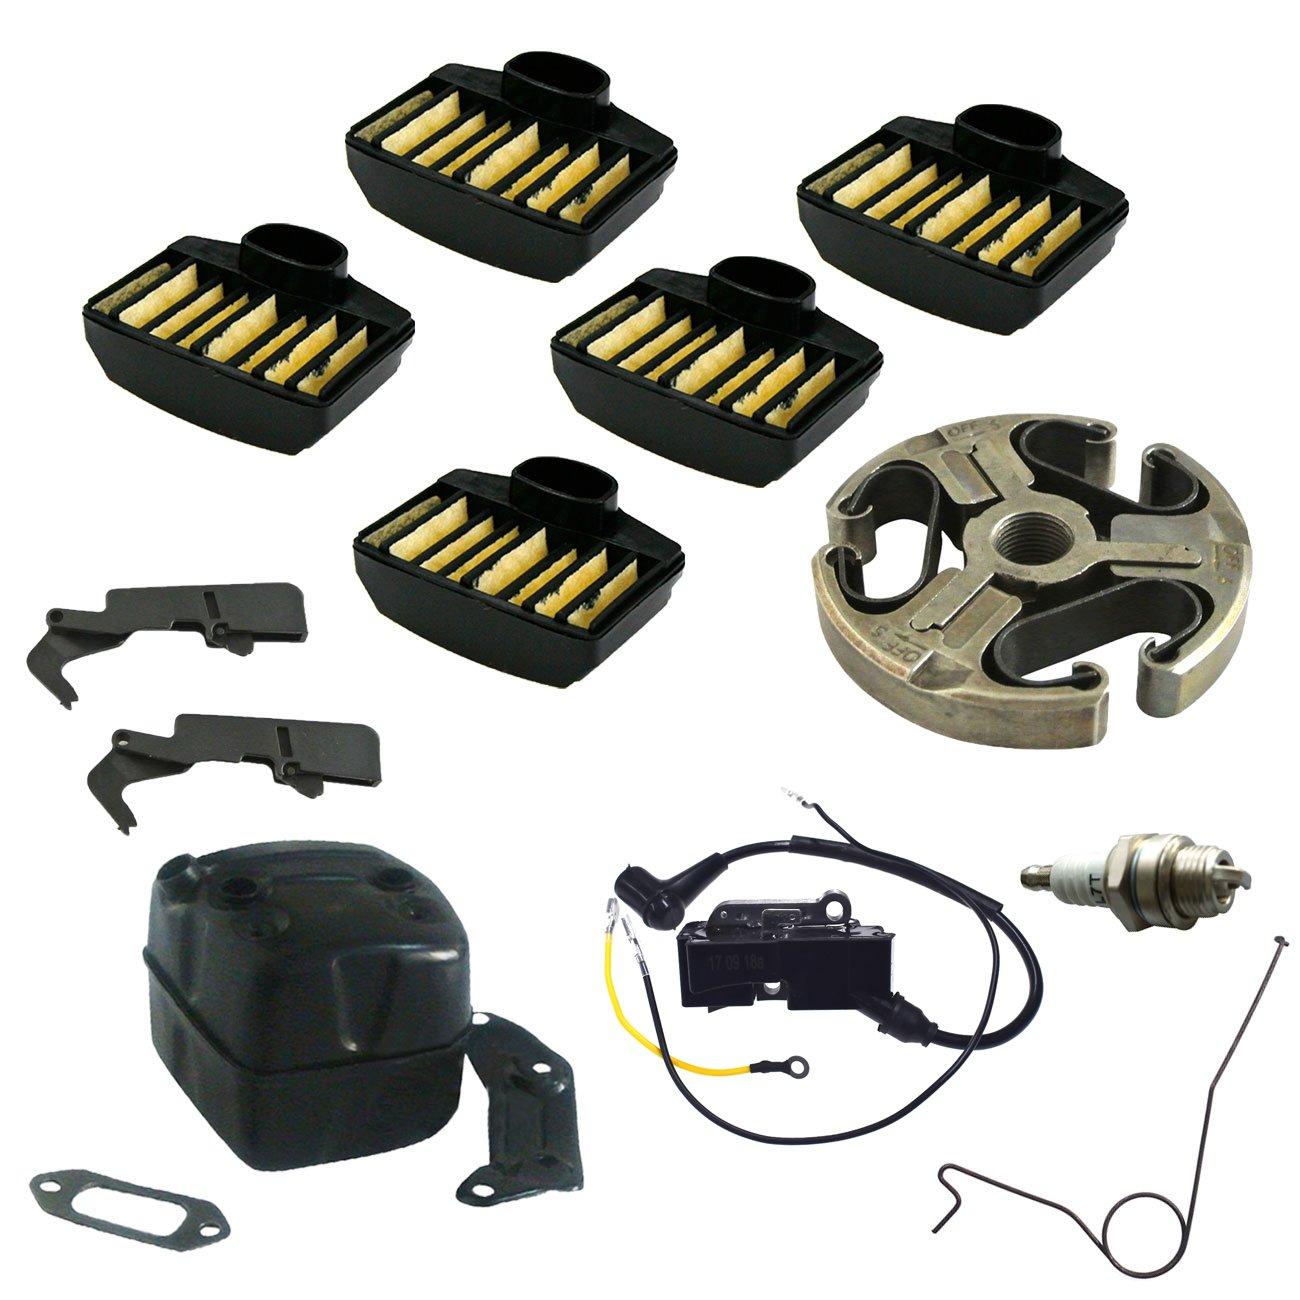 JRL Trigger Support Clutch Spark plug For HUSQVARNA 362 365 371 372 XP Kang Di